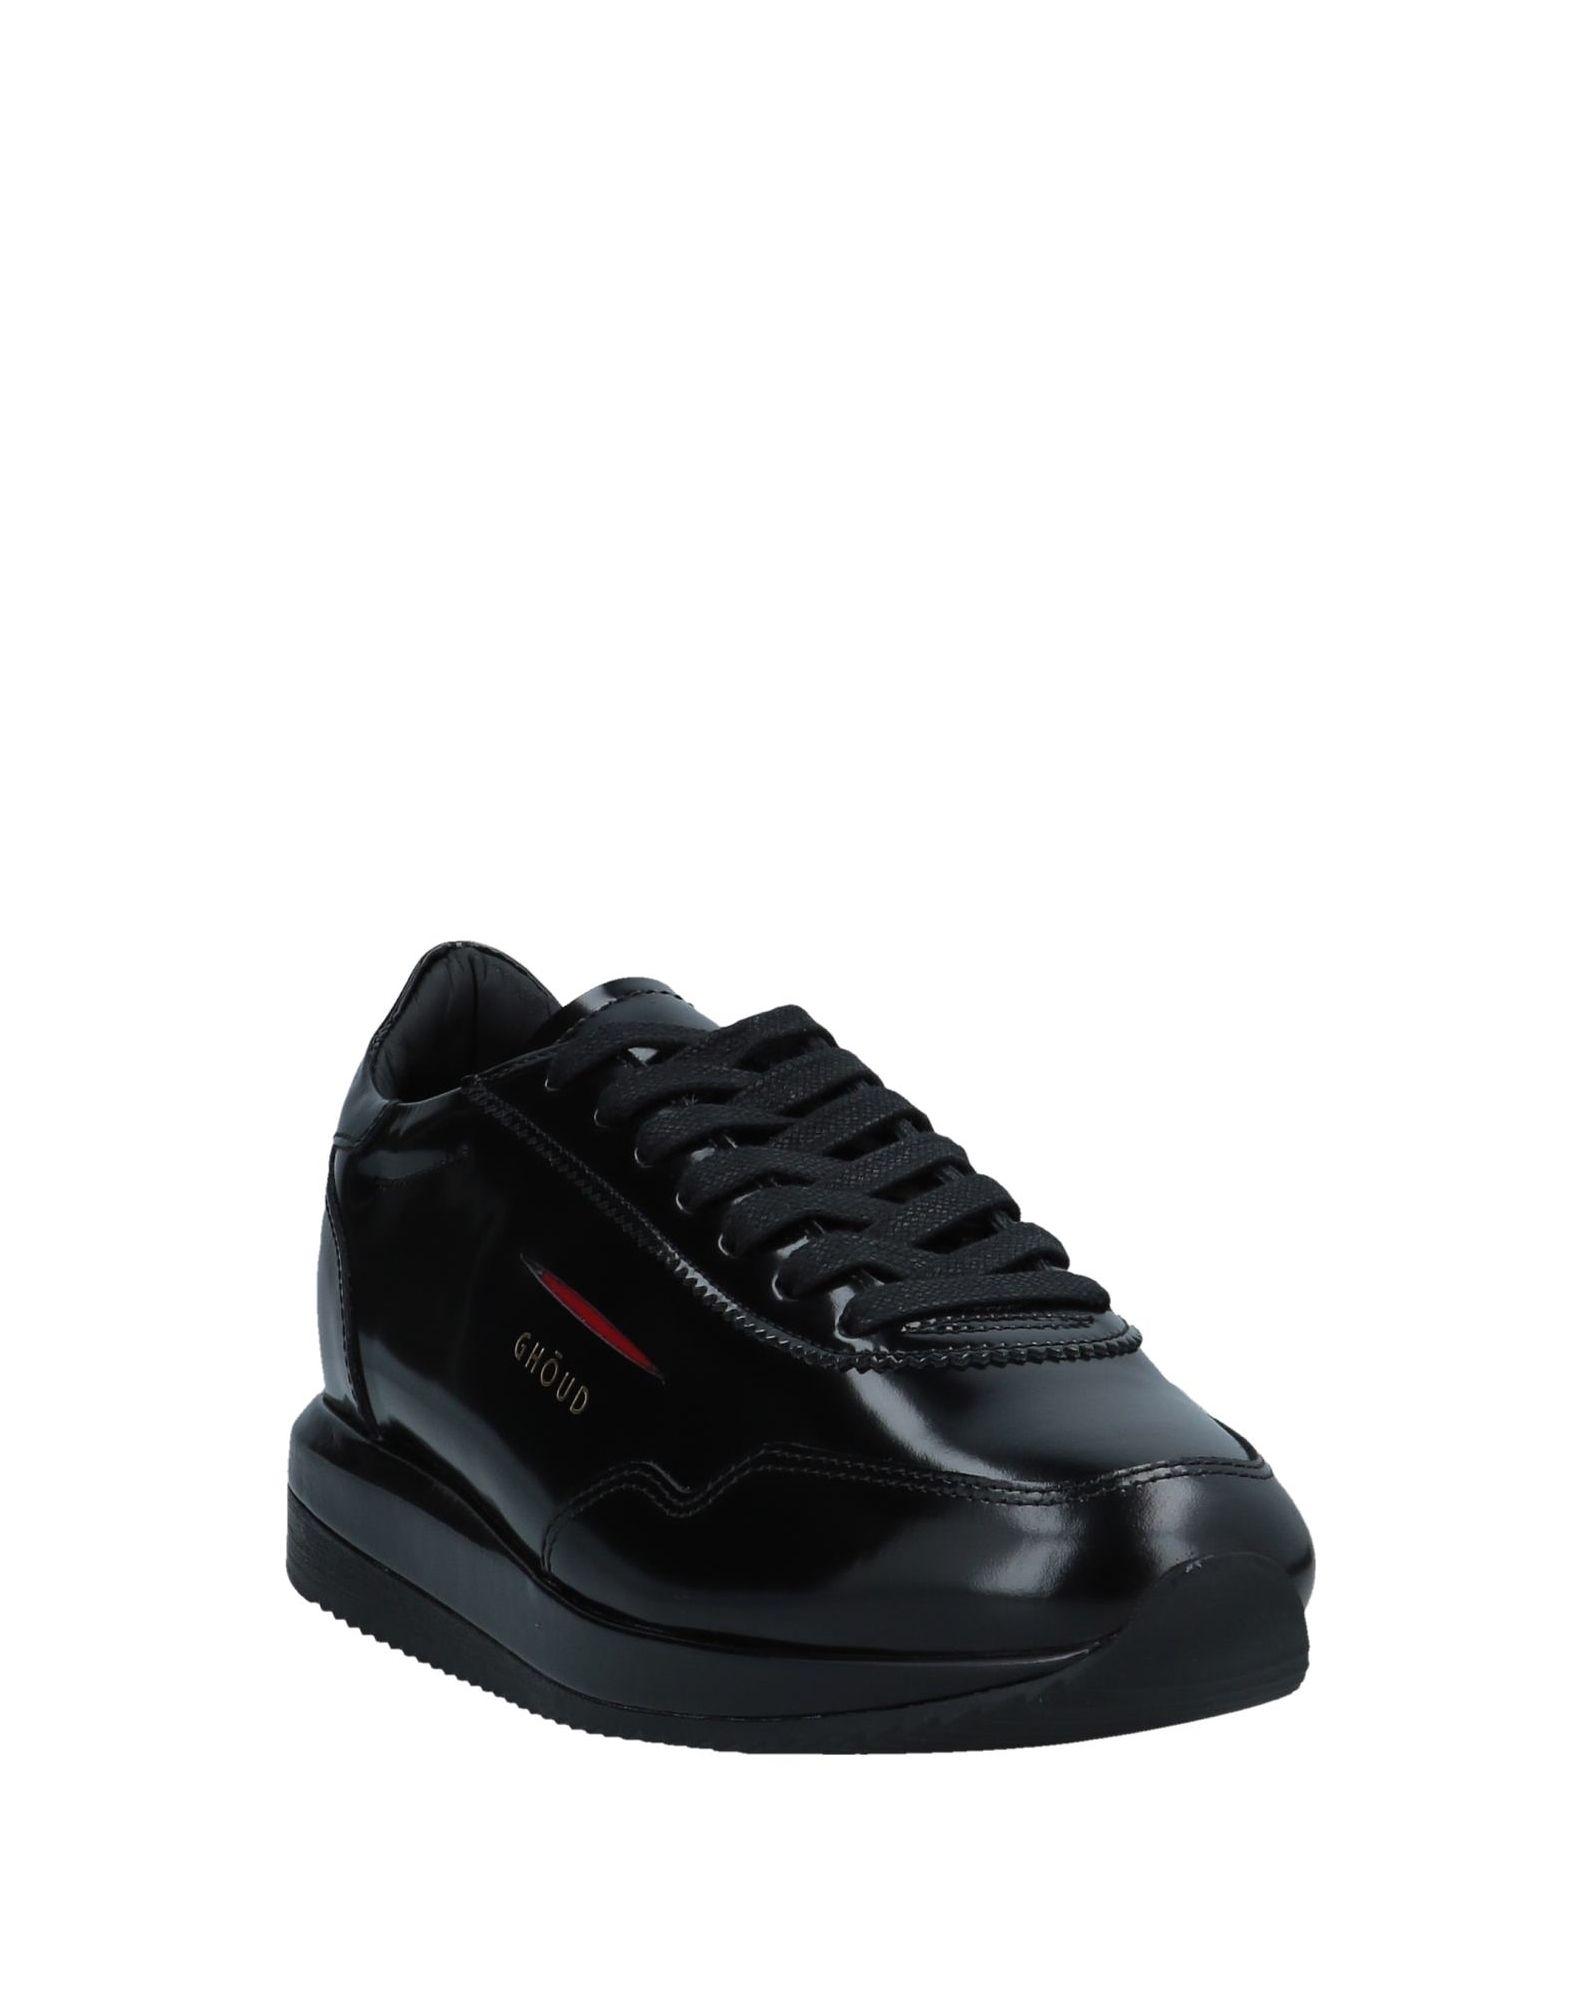 Ghōud Venice Sneakers strapazierfähige Damen  11548850PNGut aussehende strapazierfähige Sneakers Schuhe f1c95b